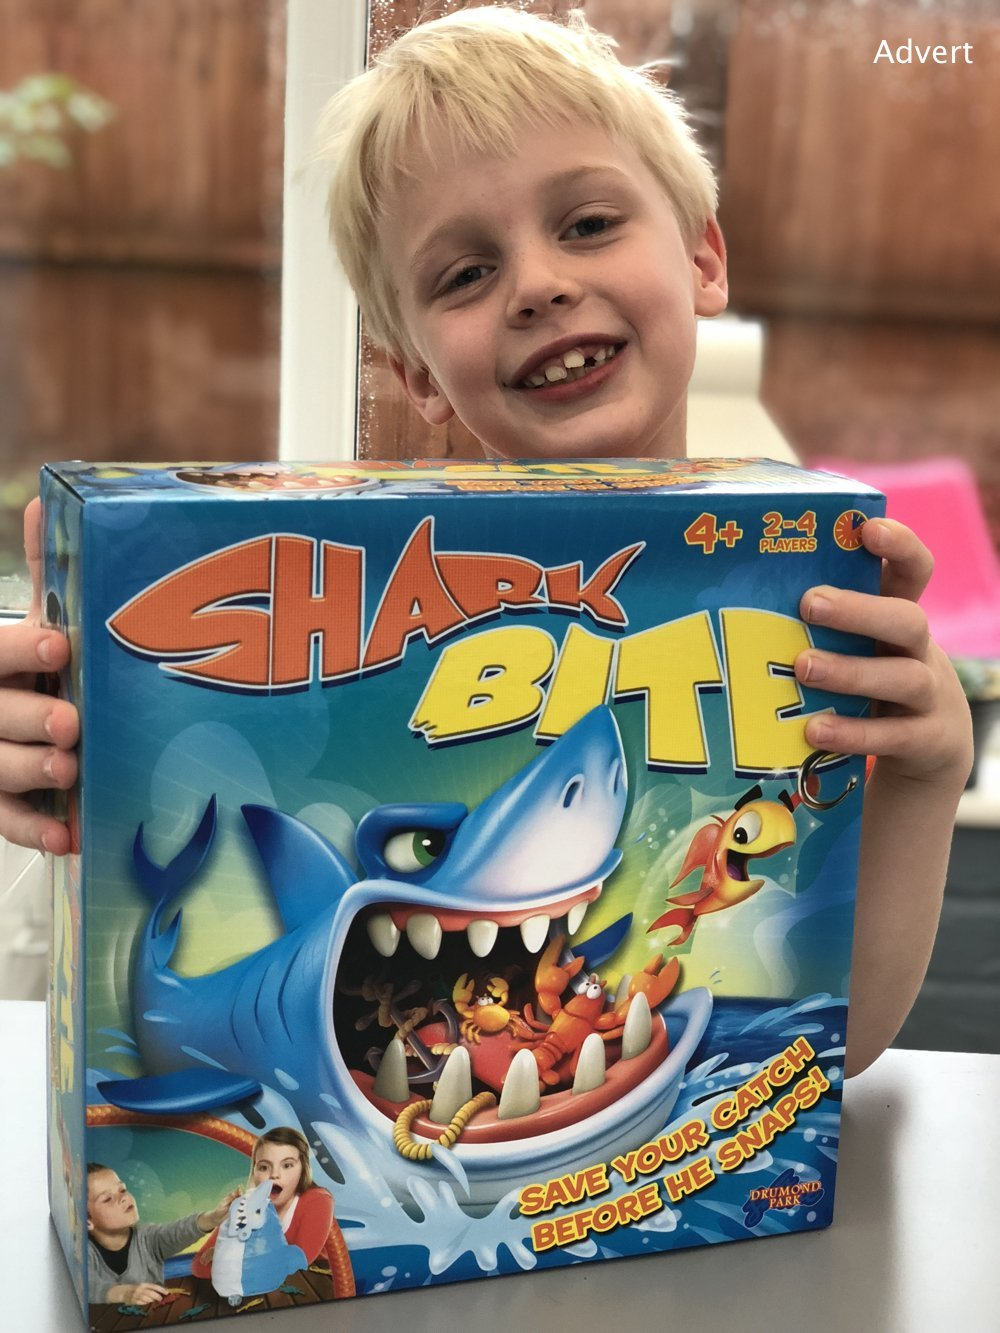 blonde boy holding Shark Bite game smiling